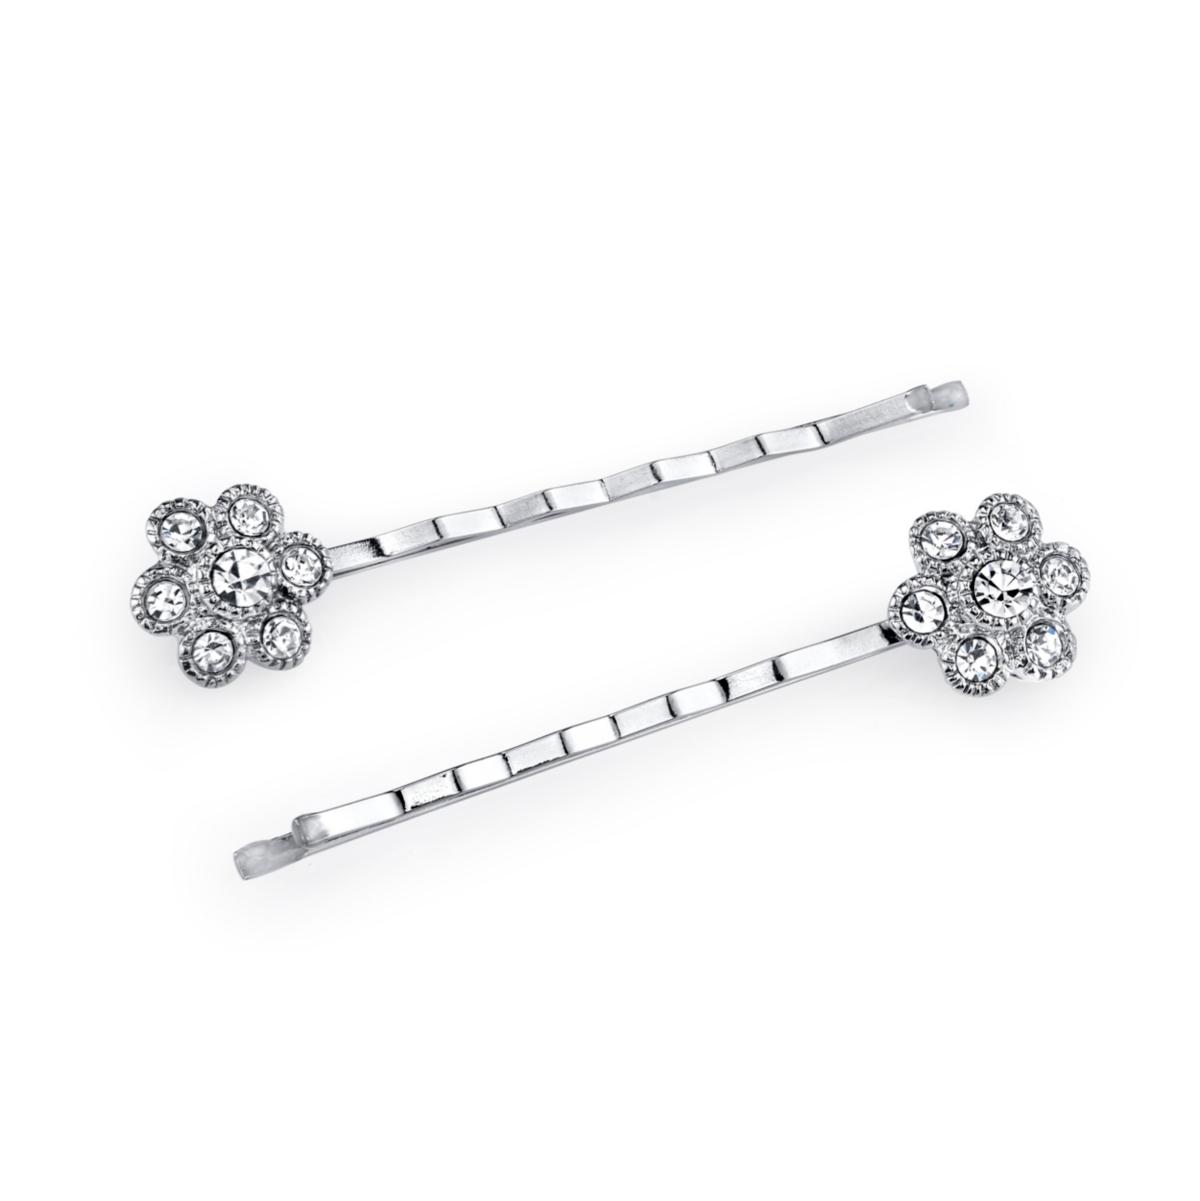 2028 Silver-Tone Crystal Flower Bobby Pin Set